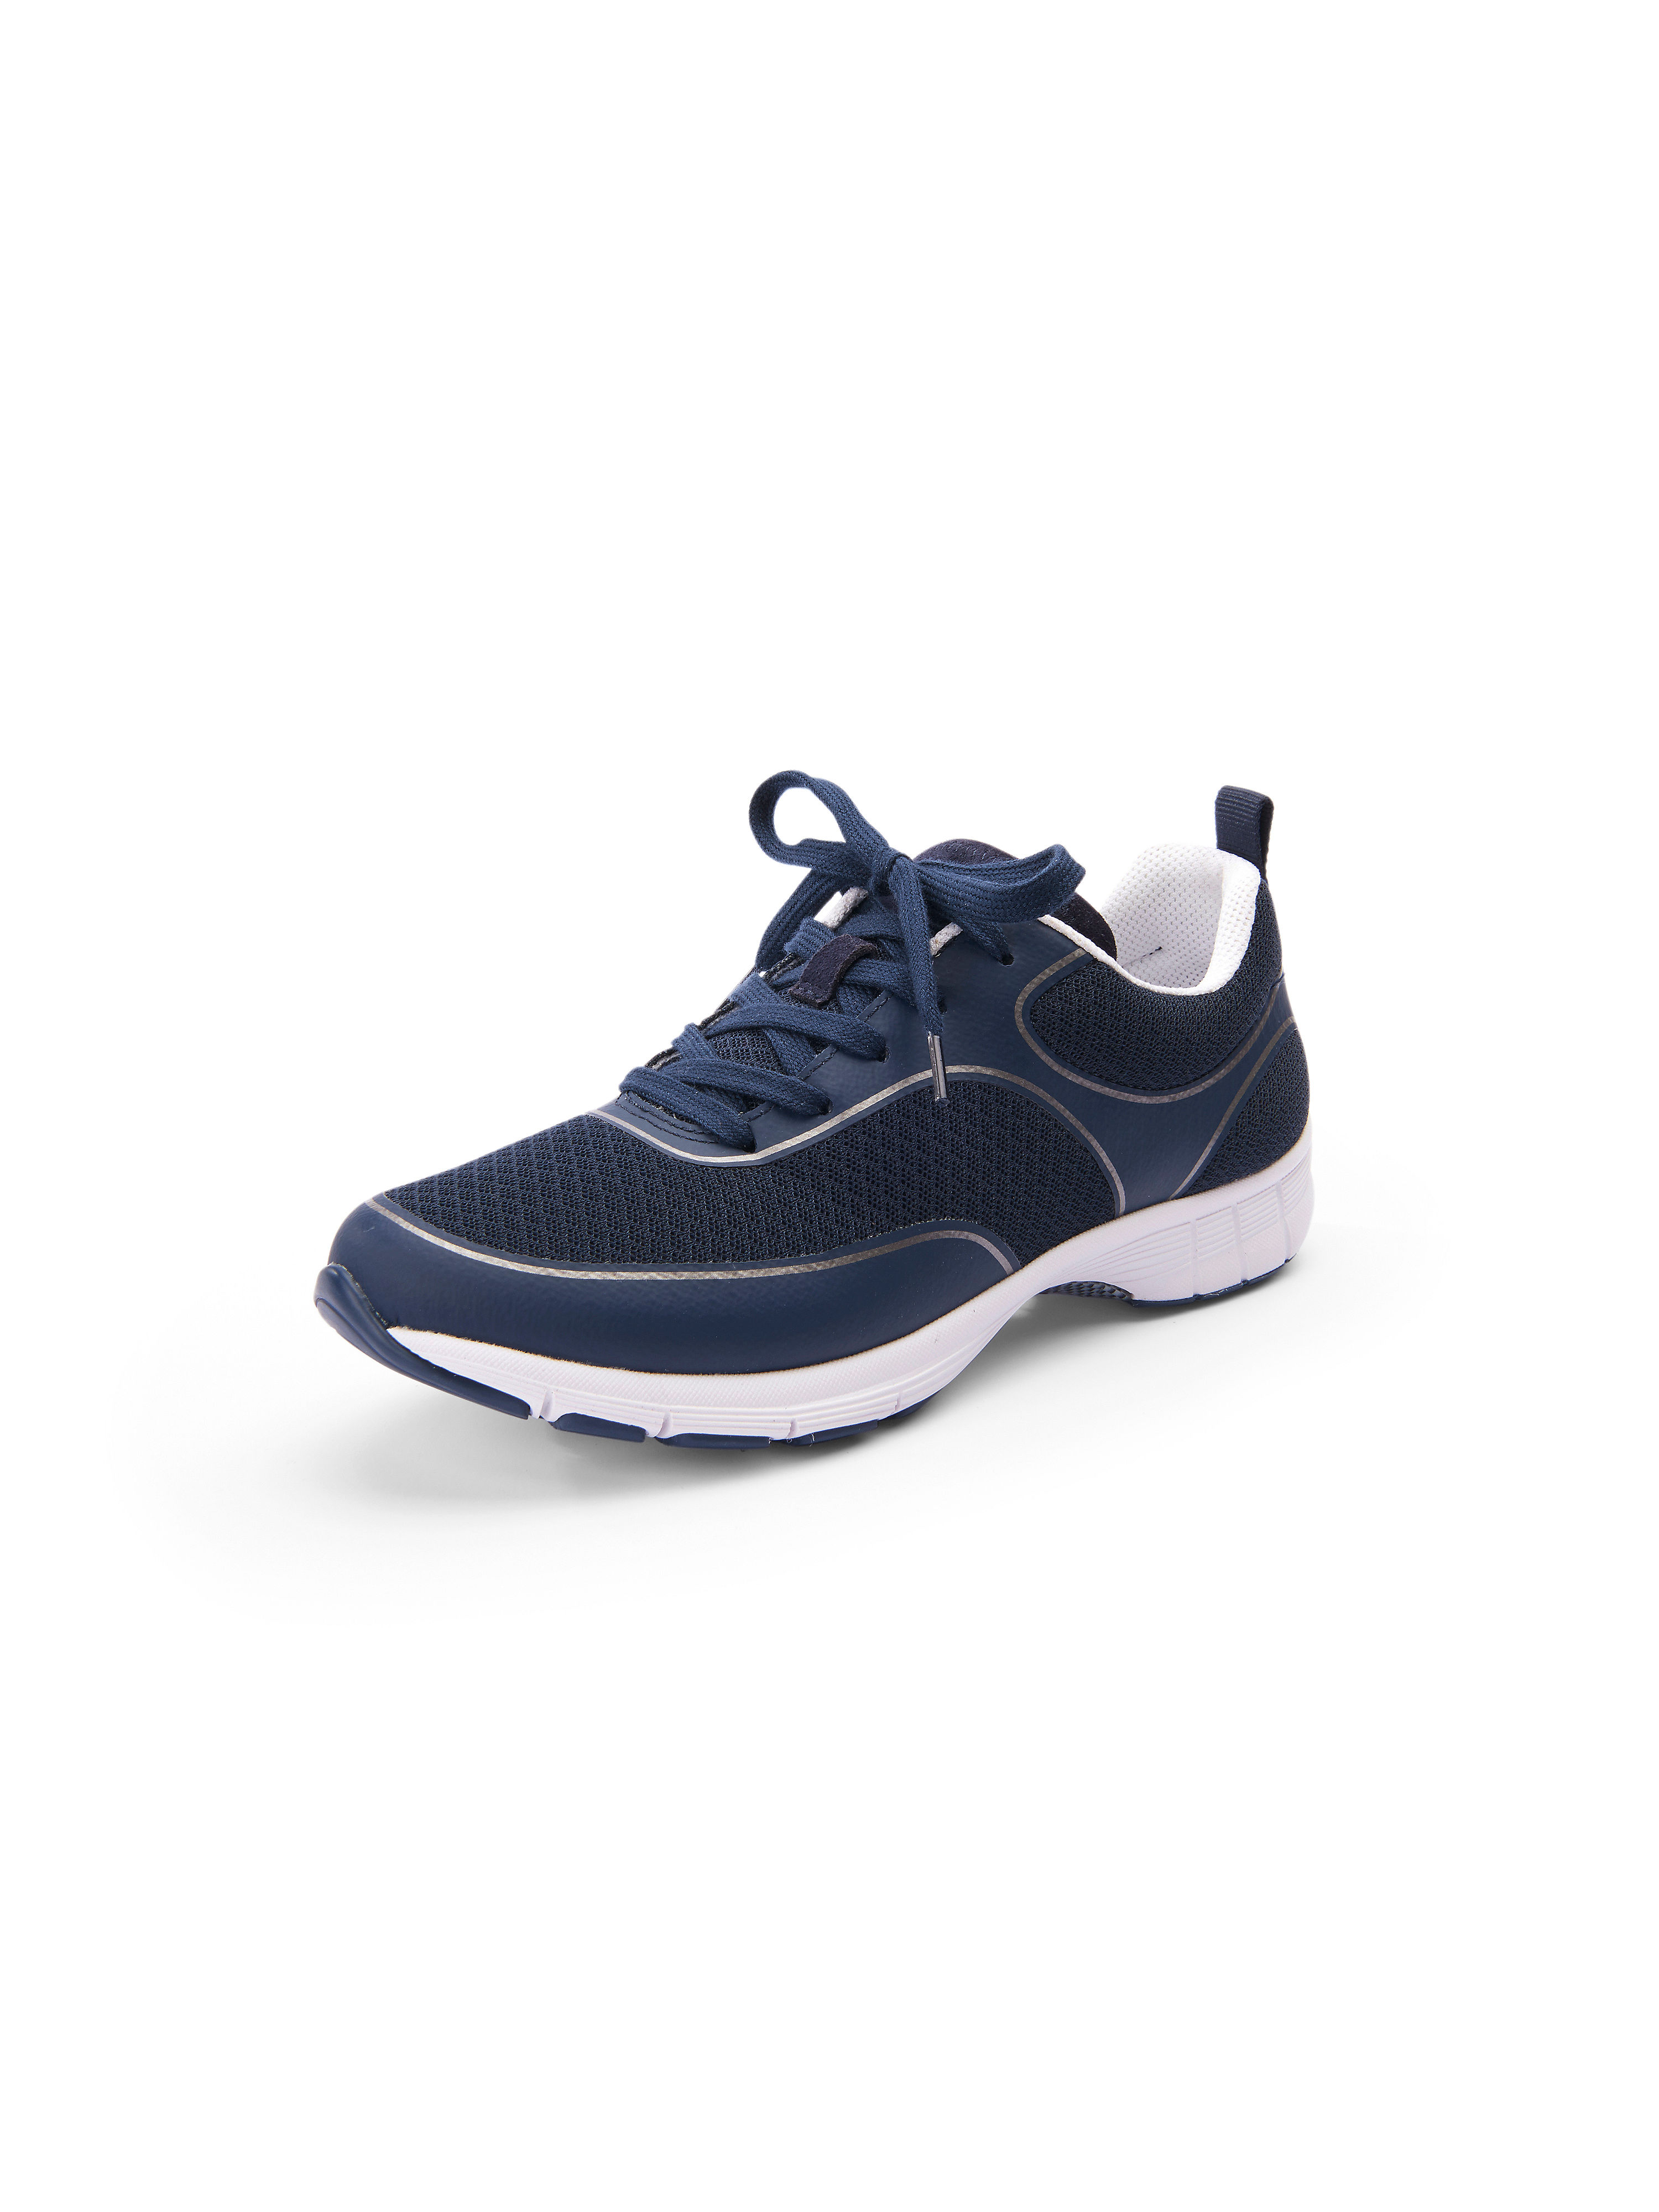 Sneaker Gabor blau Größe: 36